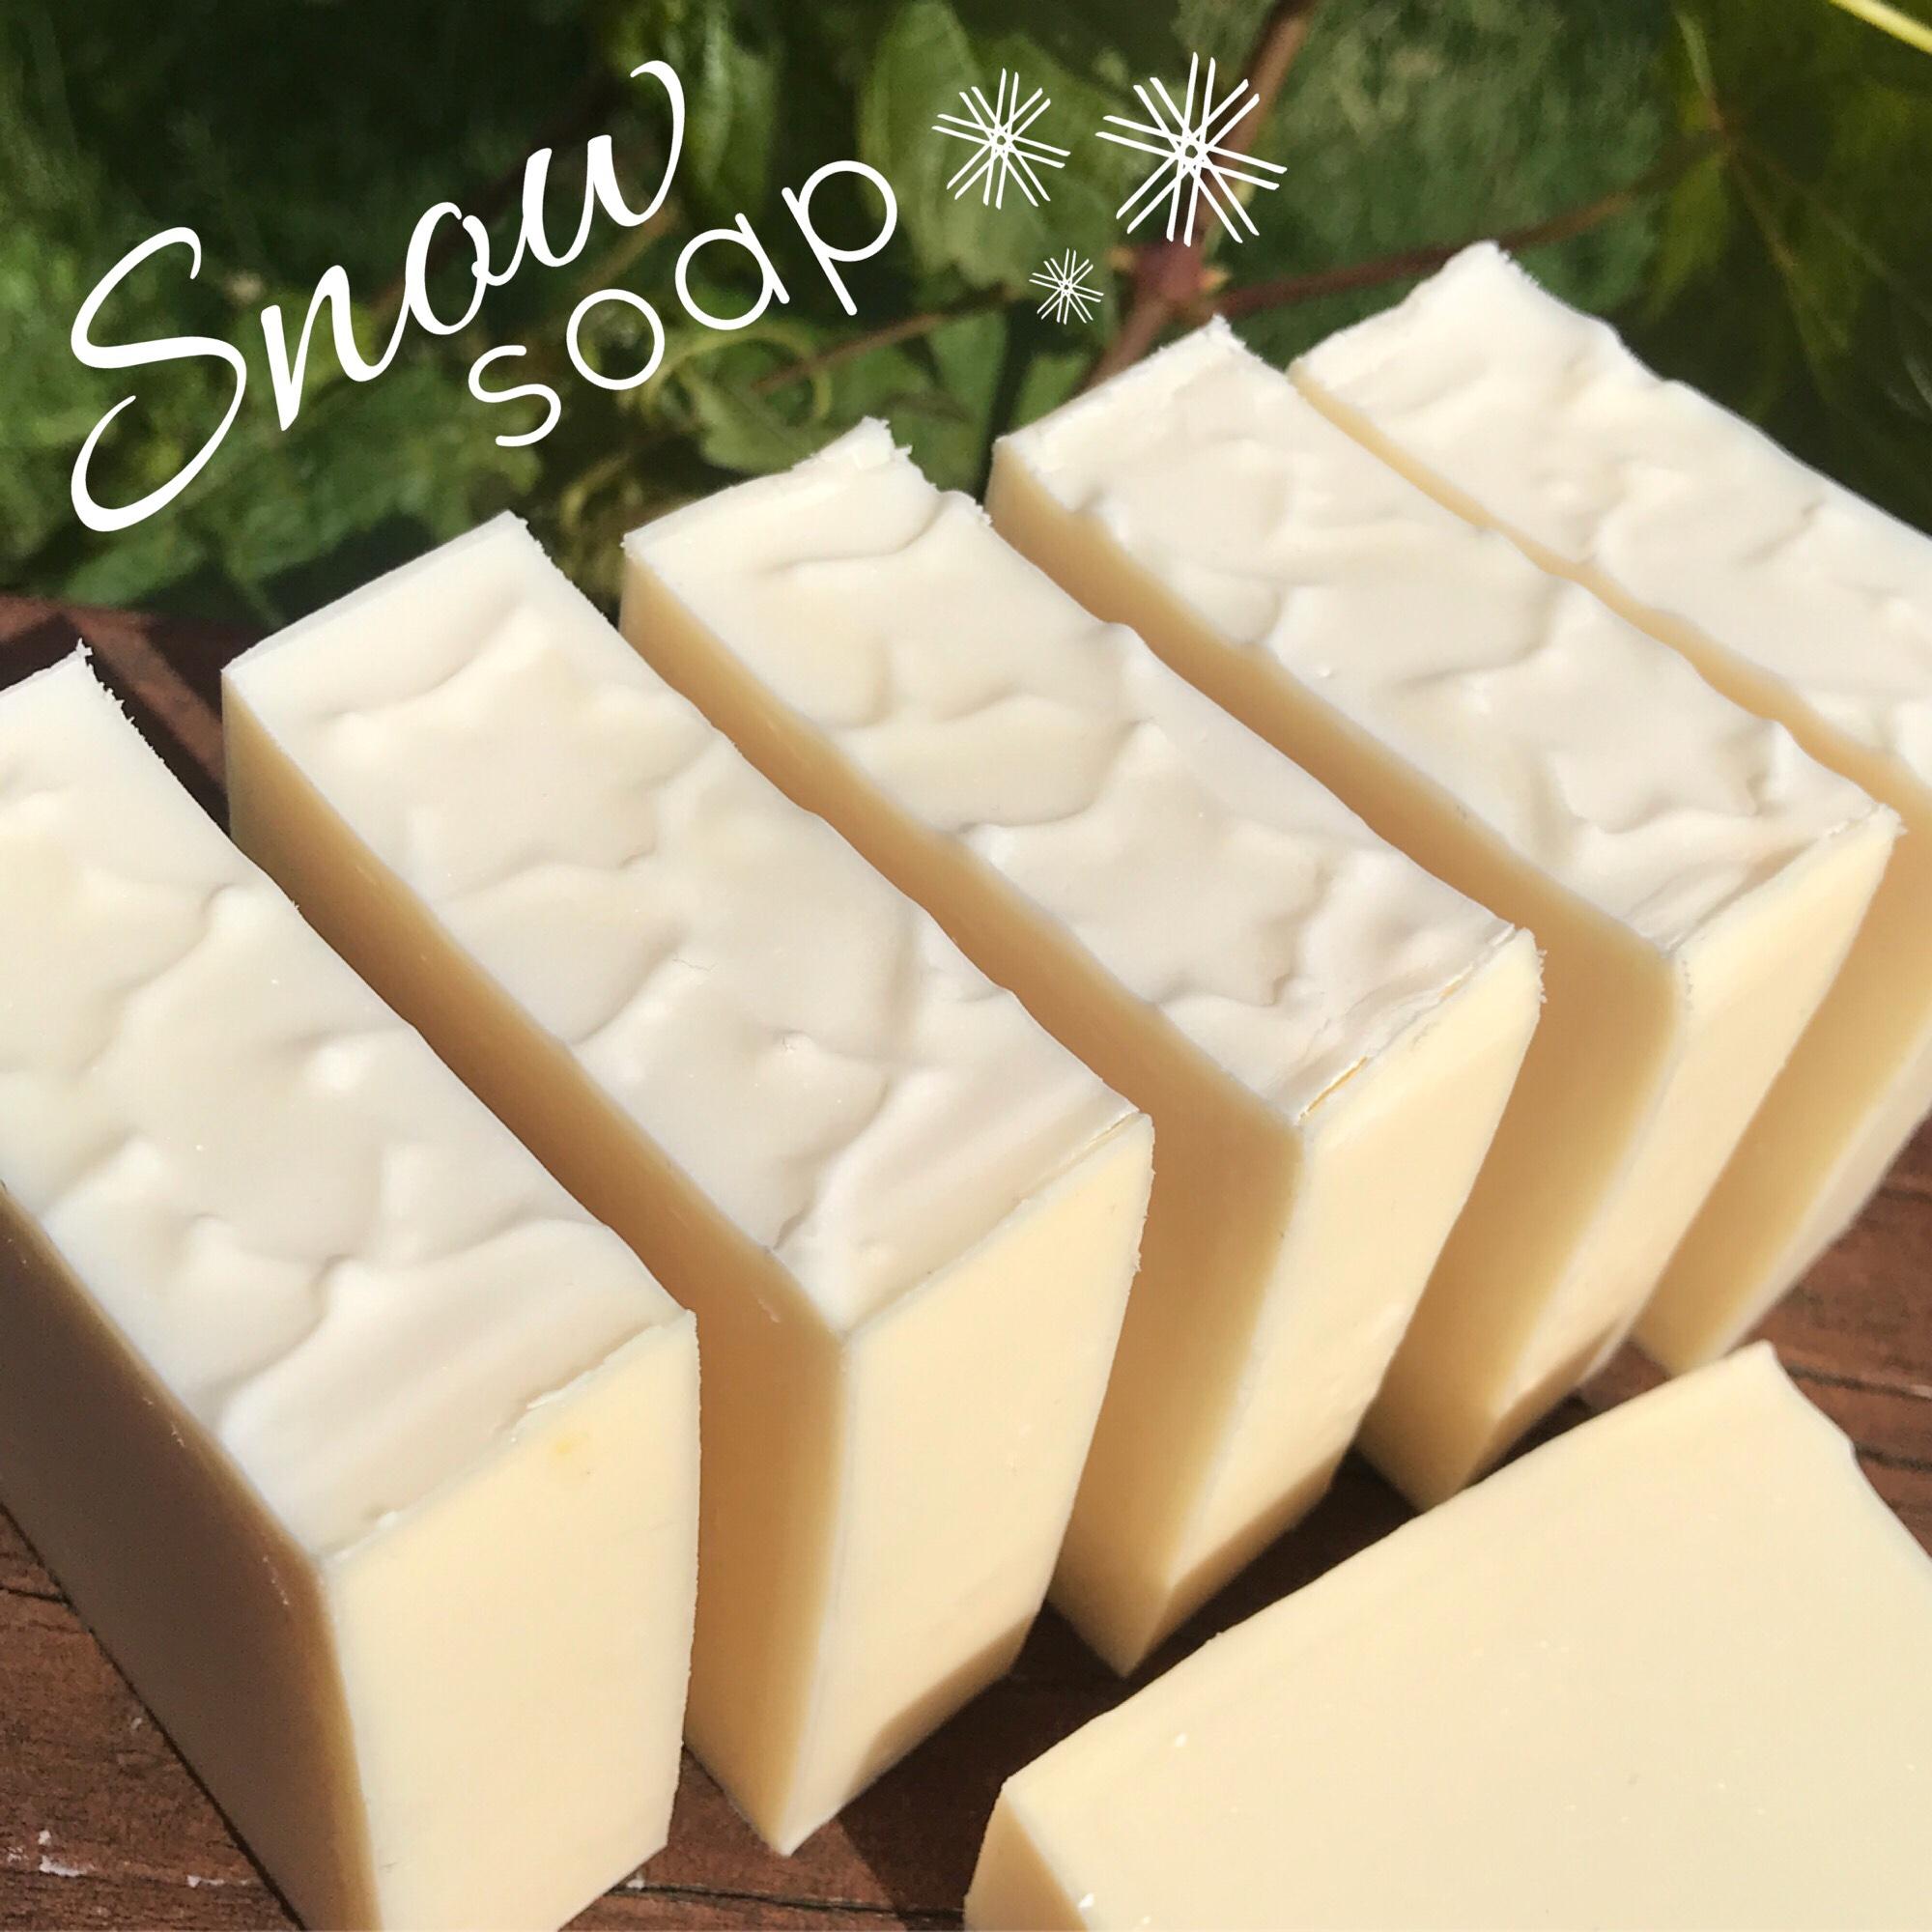 Snow soap